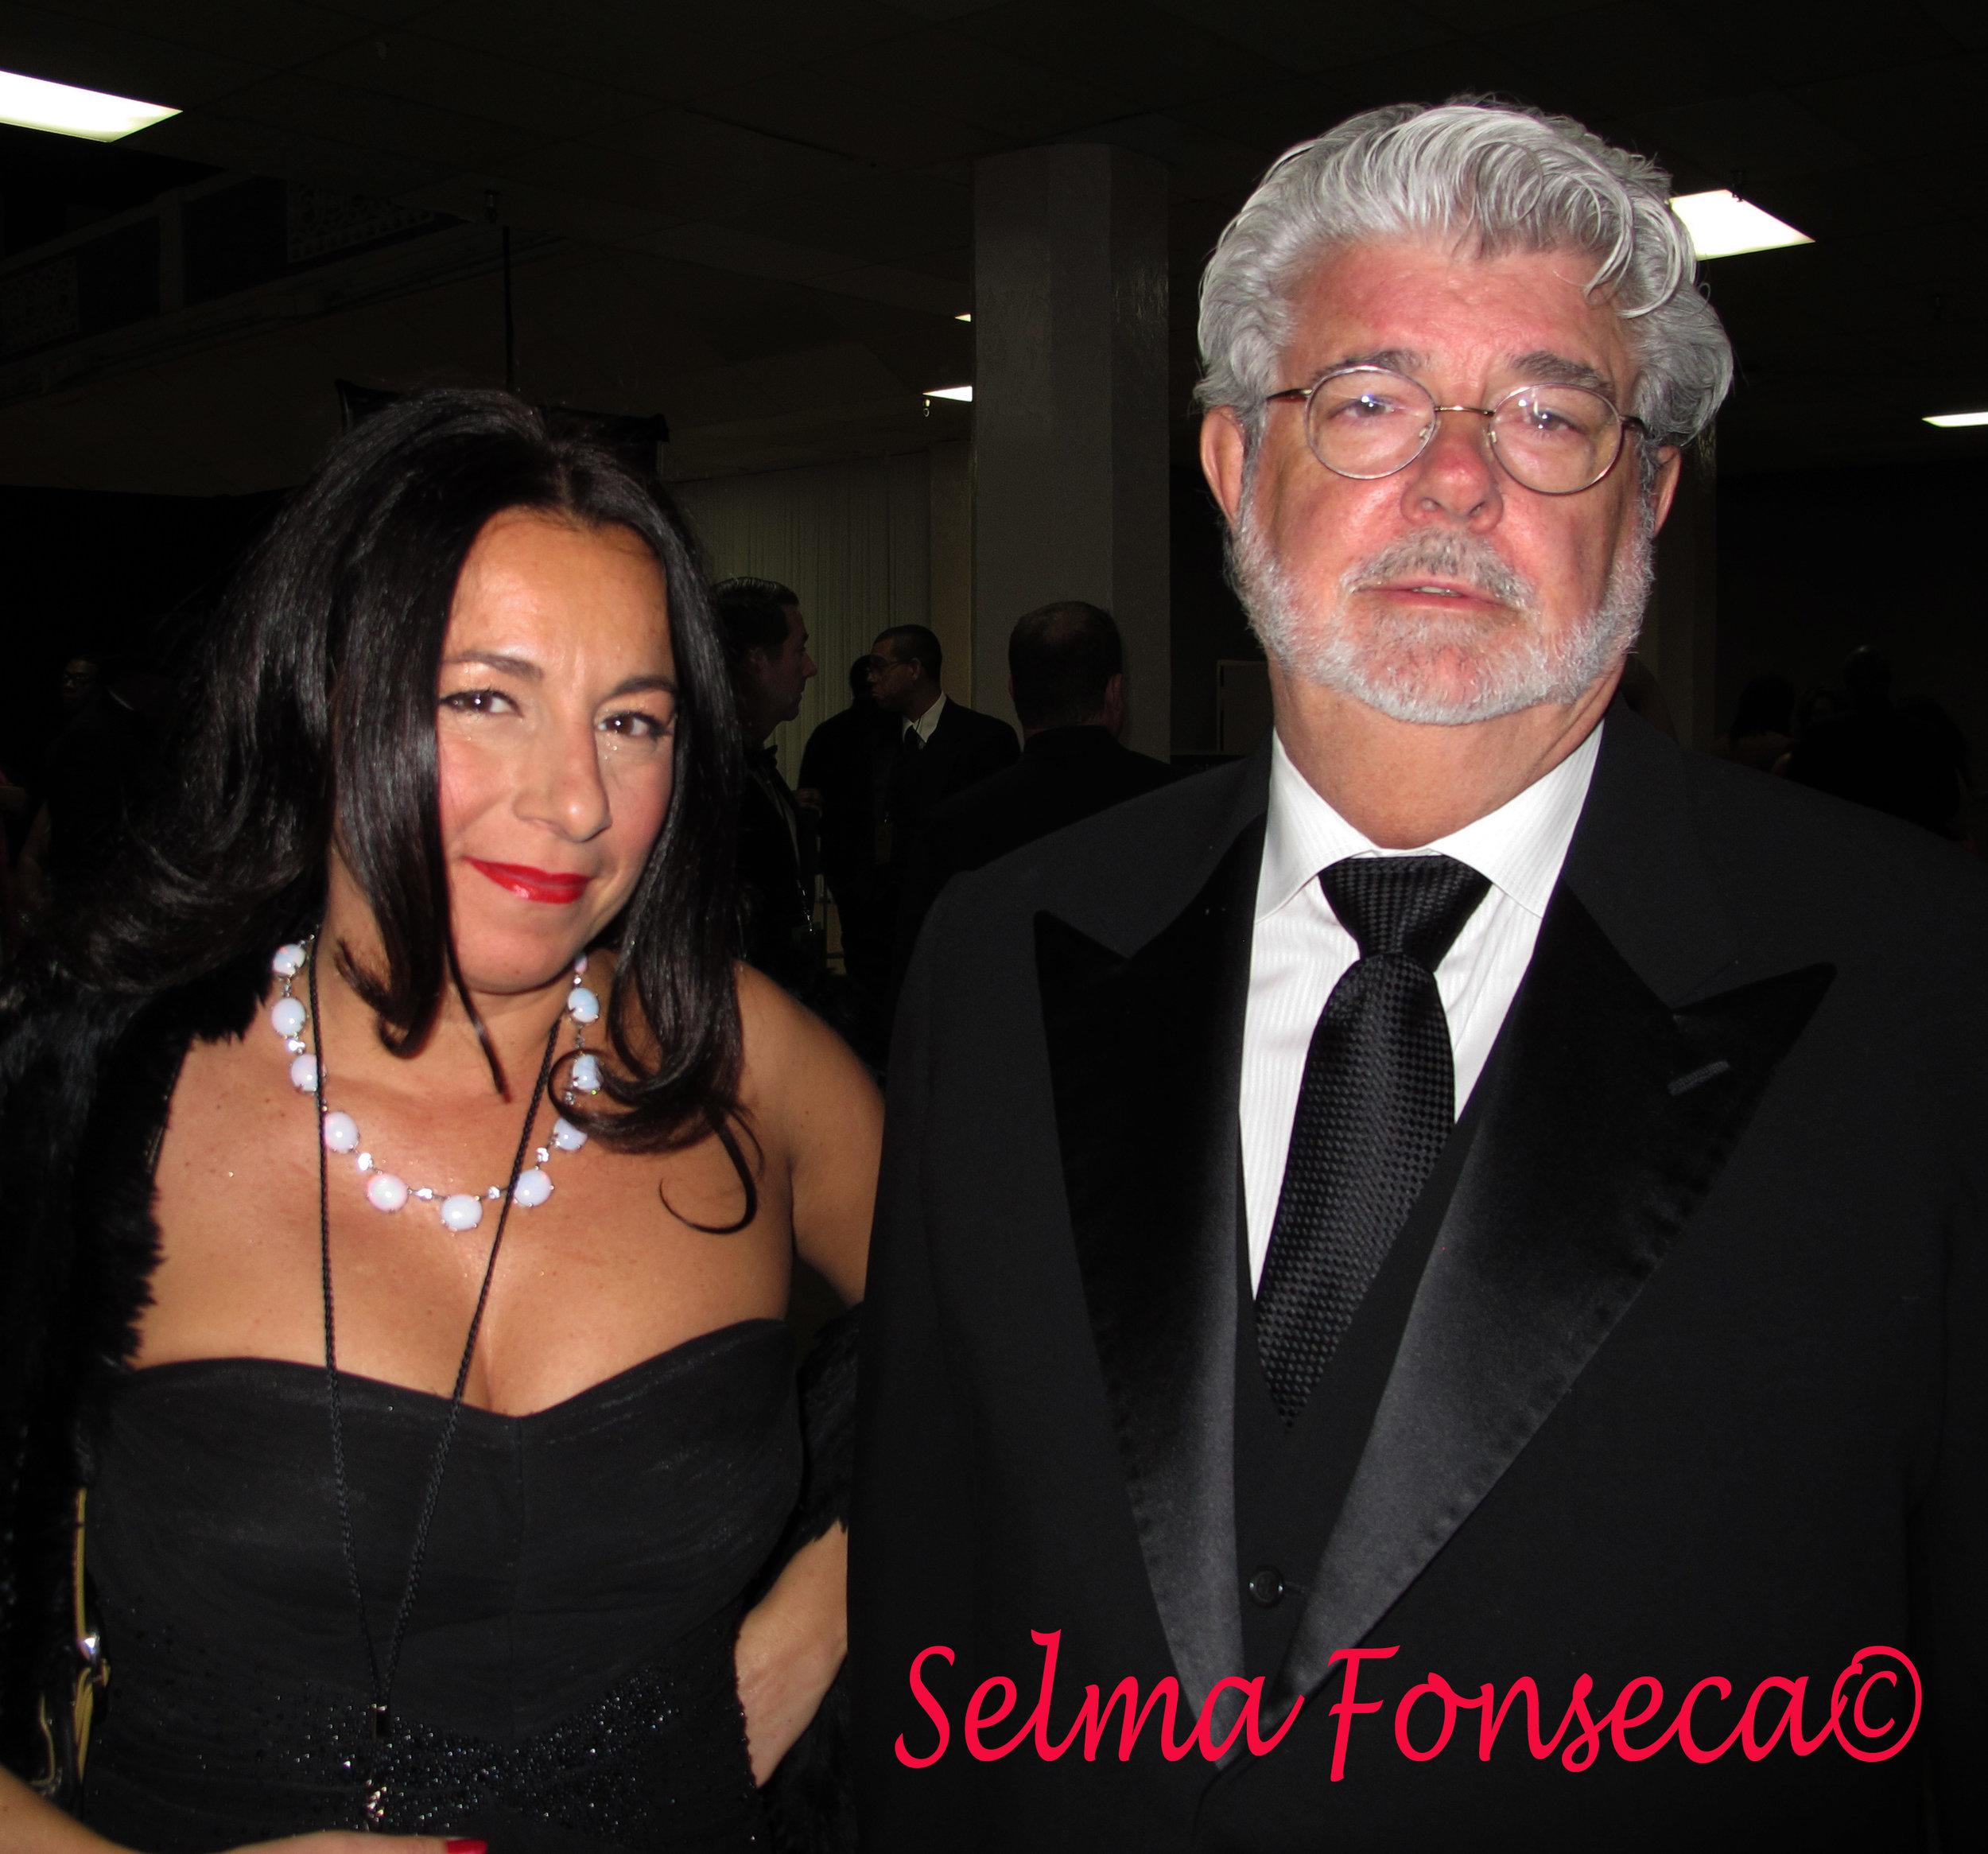 George Lucas_Selma Fonseca.JPG